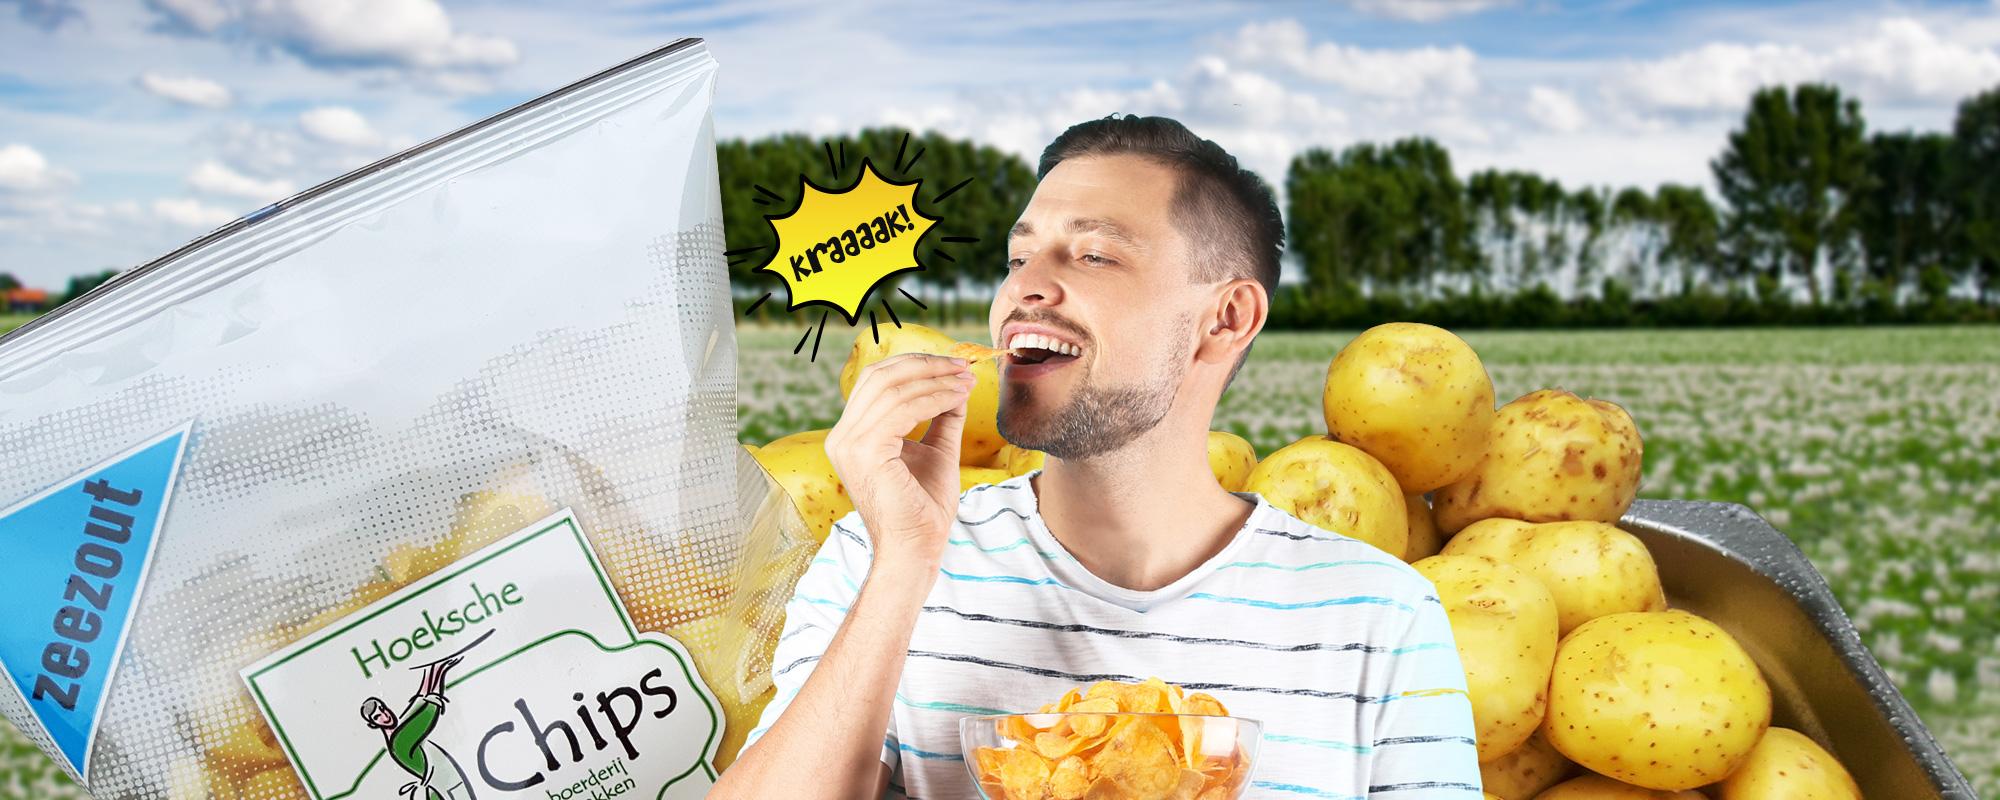 header-hoeksche-chips-home